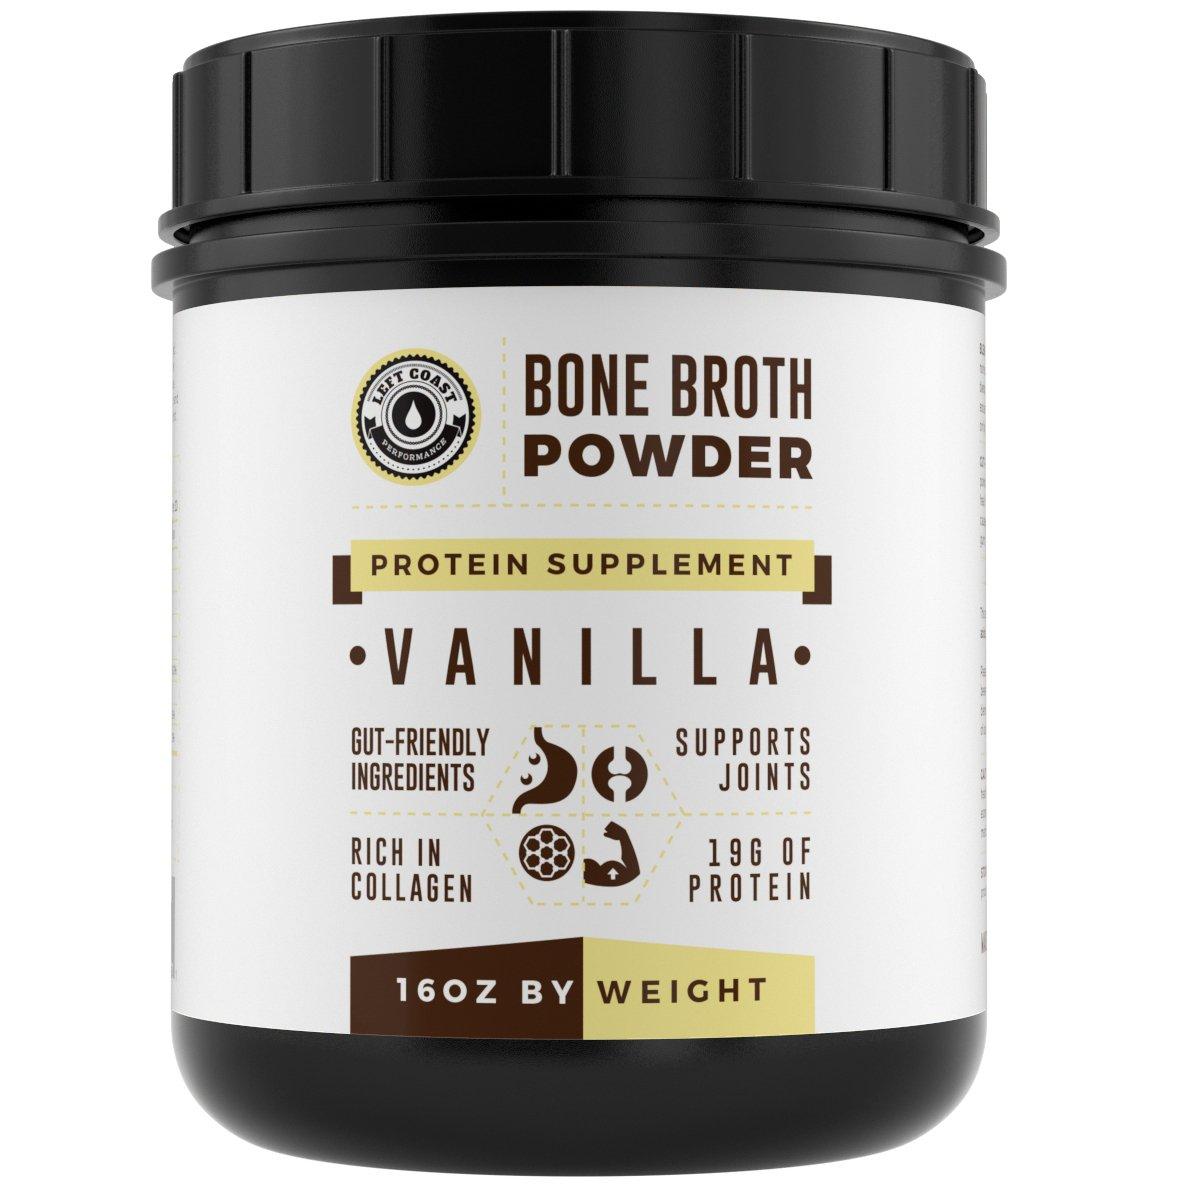 Bone Broth Protein Powder Vanilla 16Oz, Grass Fed - Non-GMO, Gut-Friendly, Dairy Free Protein Powder, Left Coast Performance